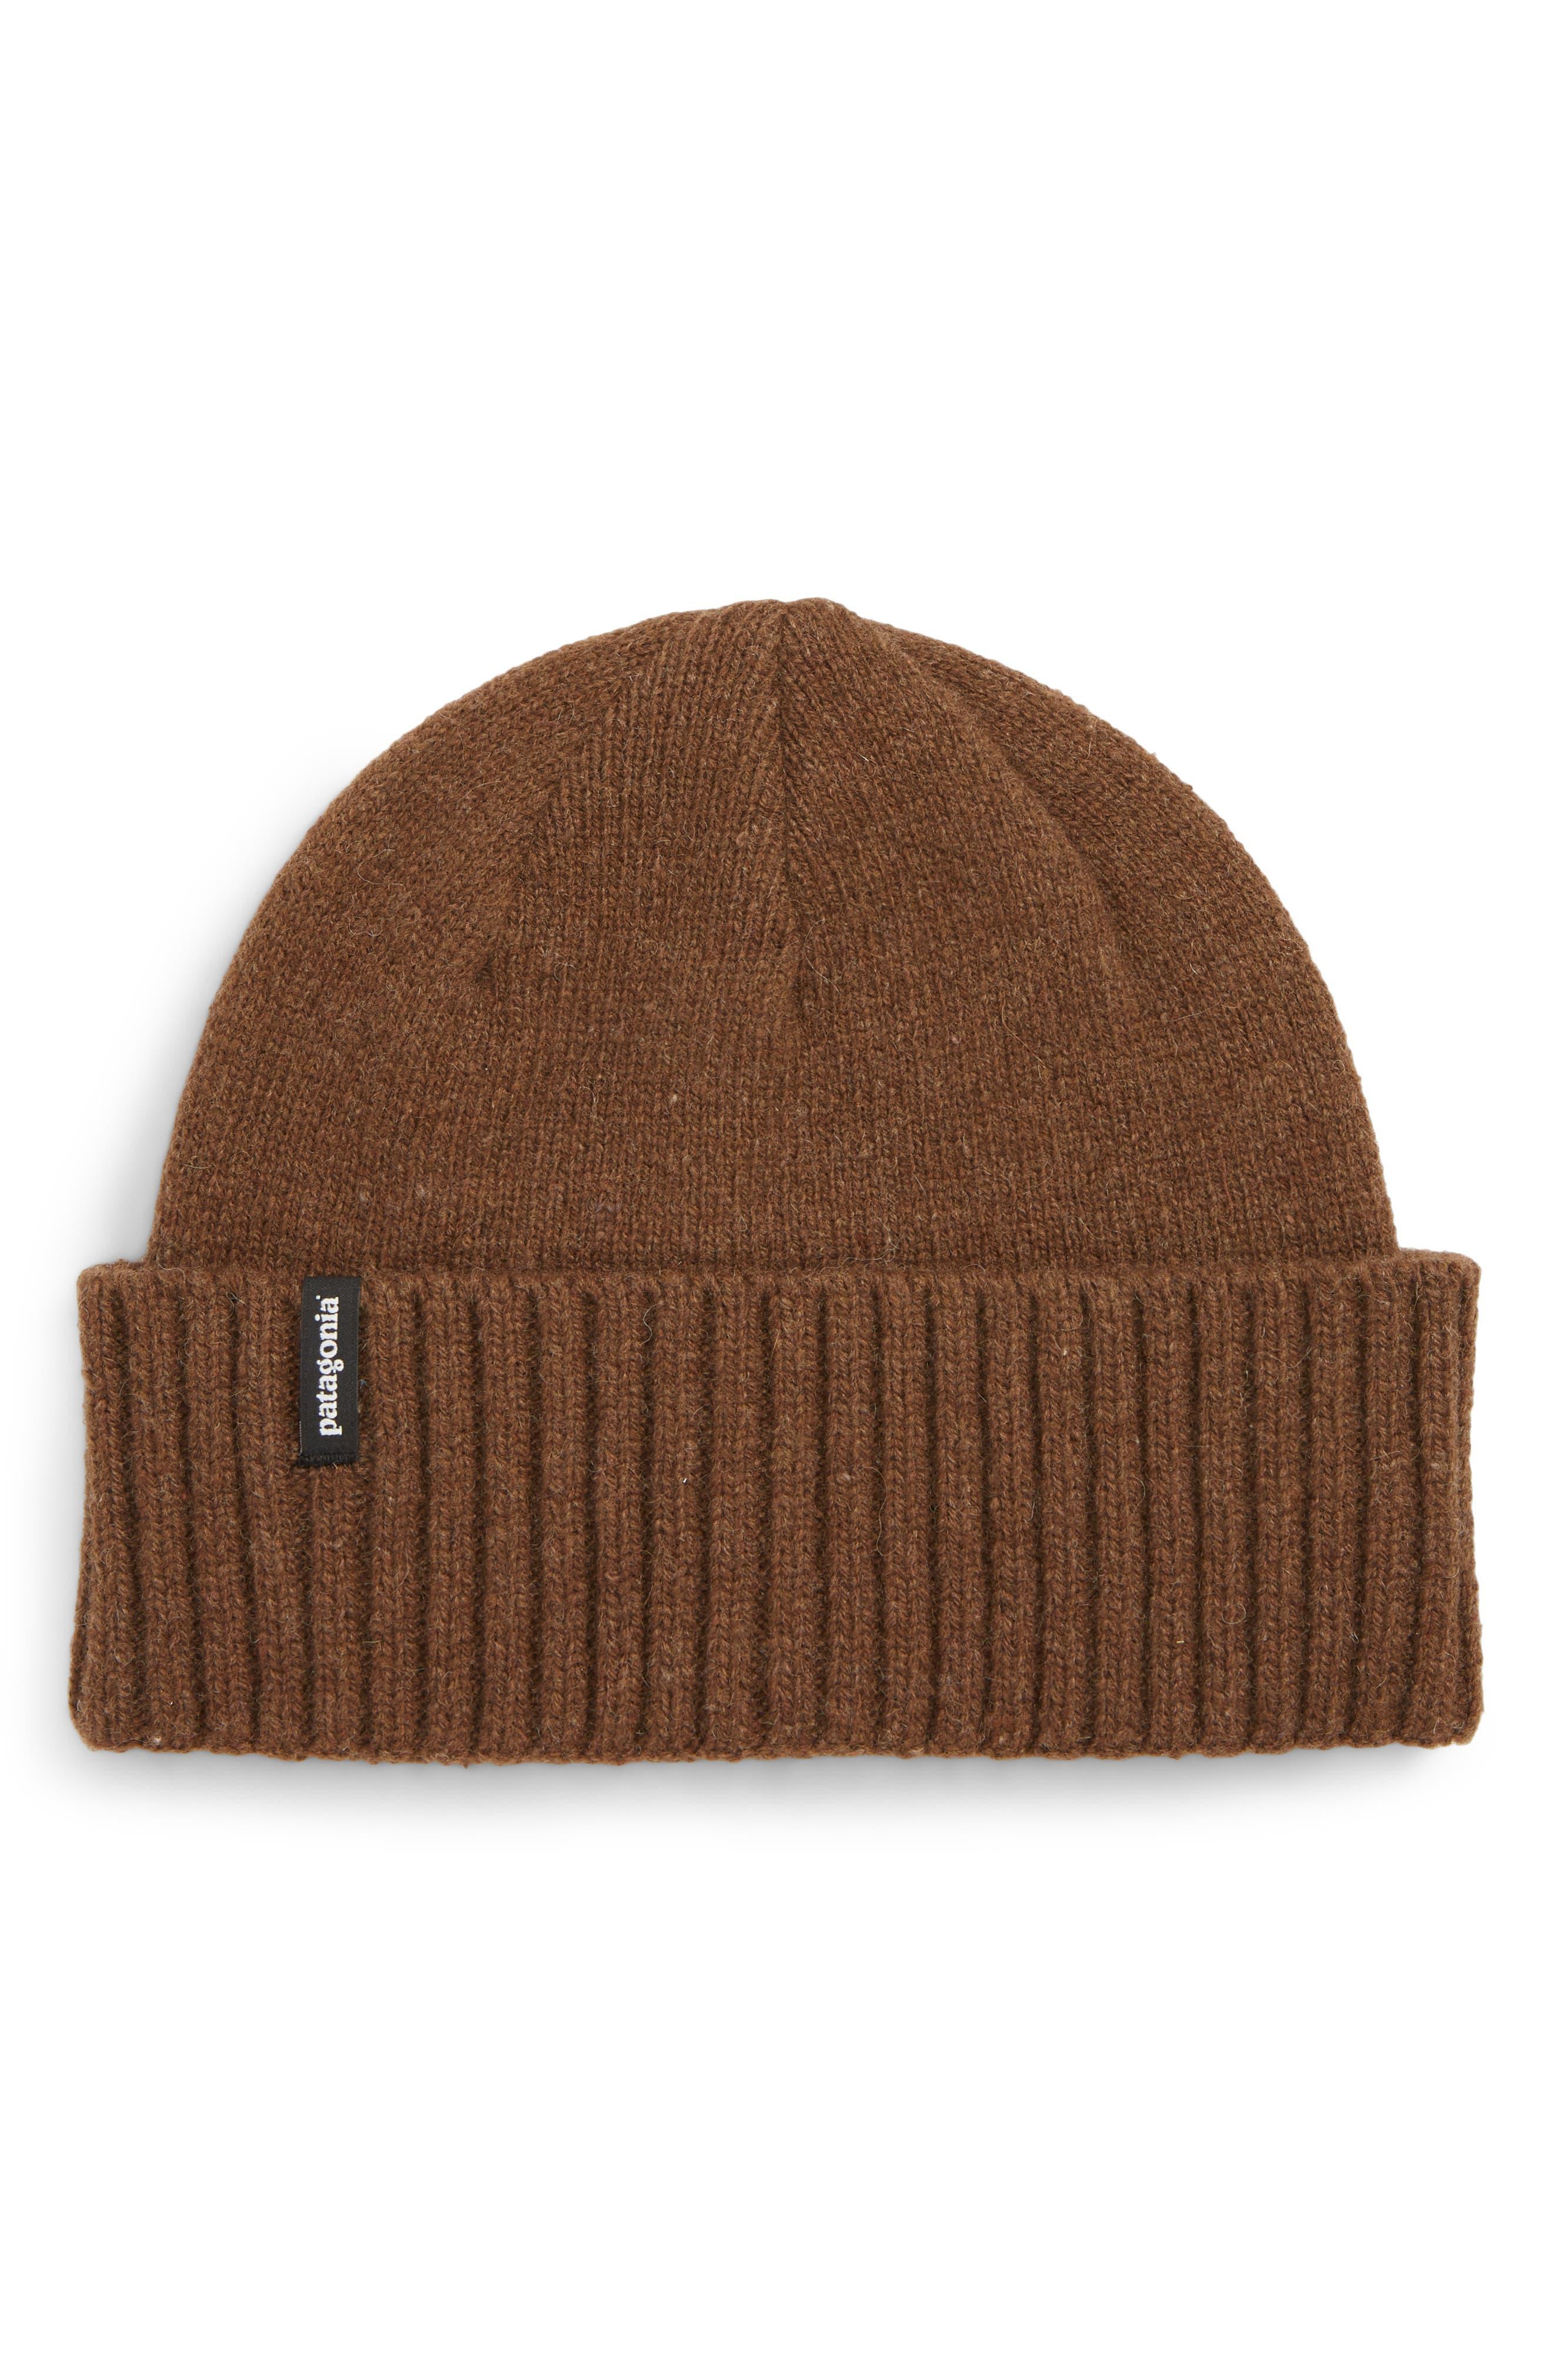 Brodeo Wool Stocking Cap,                             Main thumbnail 1, color,                             TIMBER BROWN